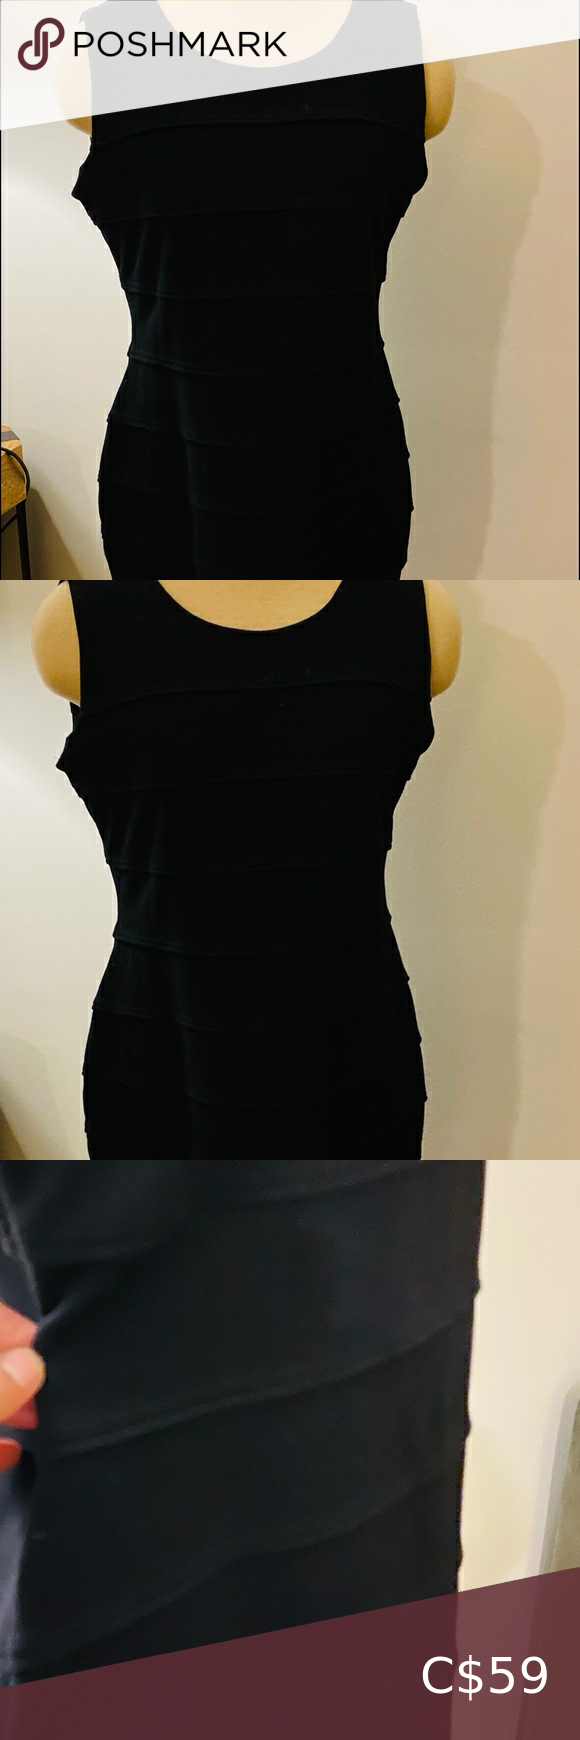 Calvin Klein Perfect Little Black Dress Perfect Little Black Dress Little Black Dress Calvin Klein Black Dress